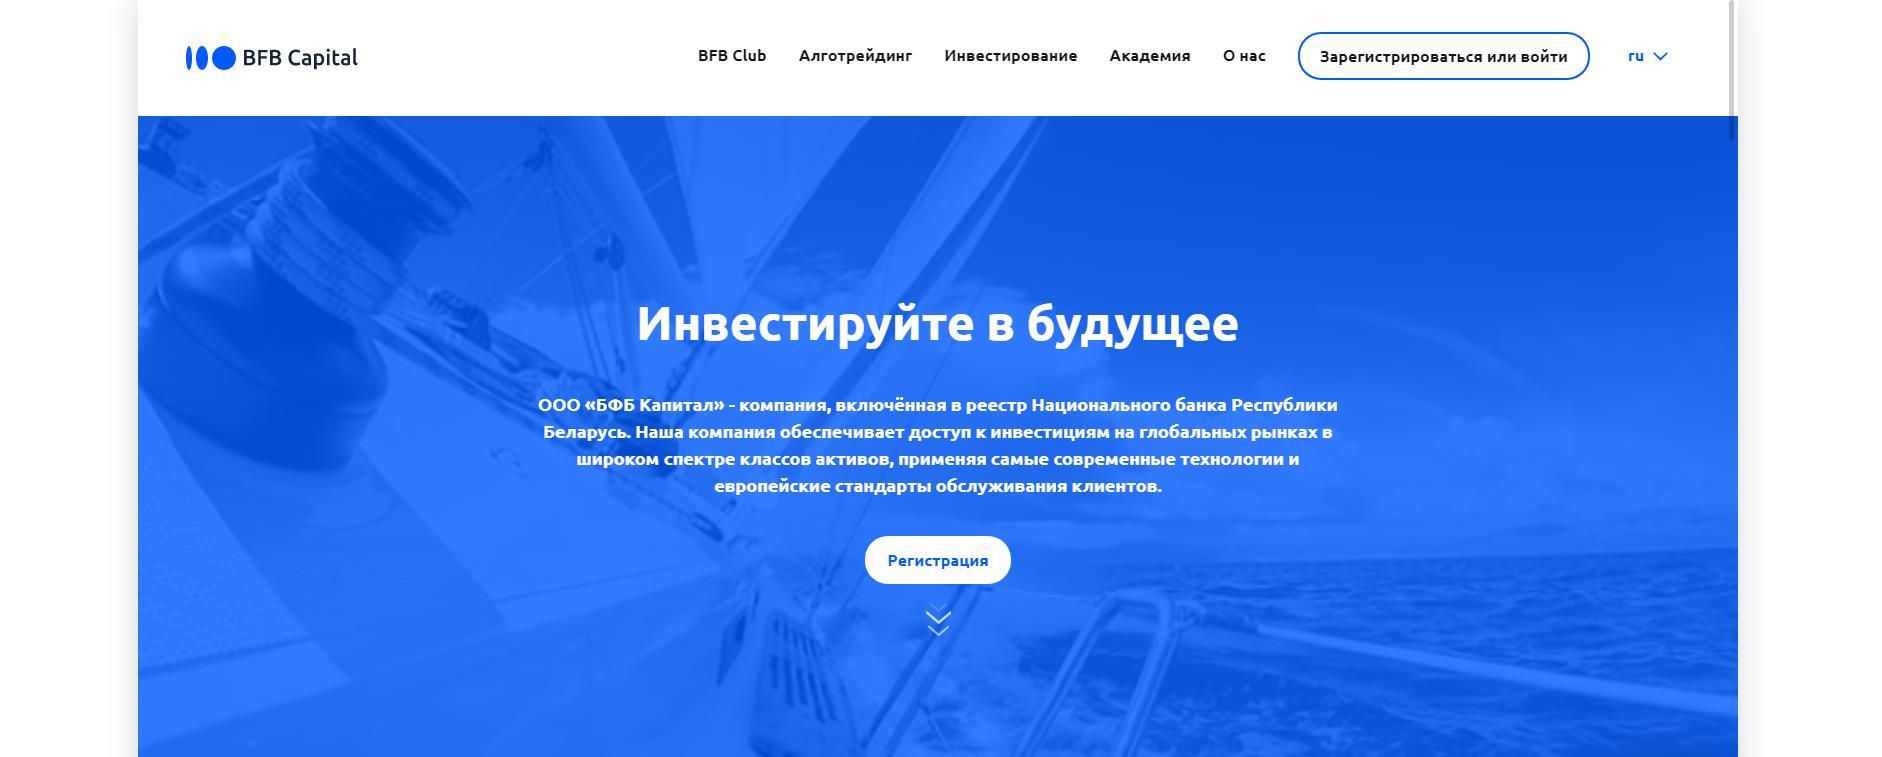 сайт брокера bfb capital